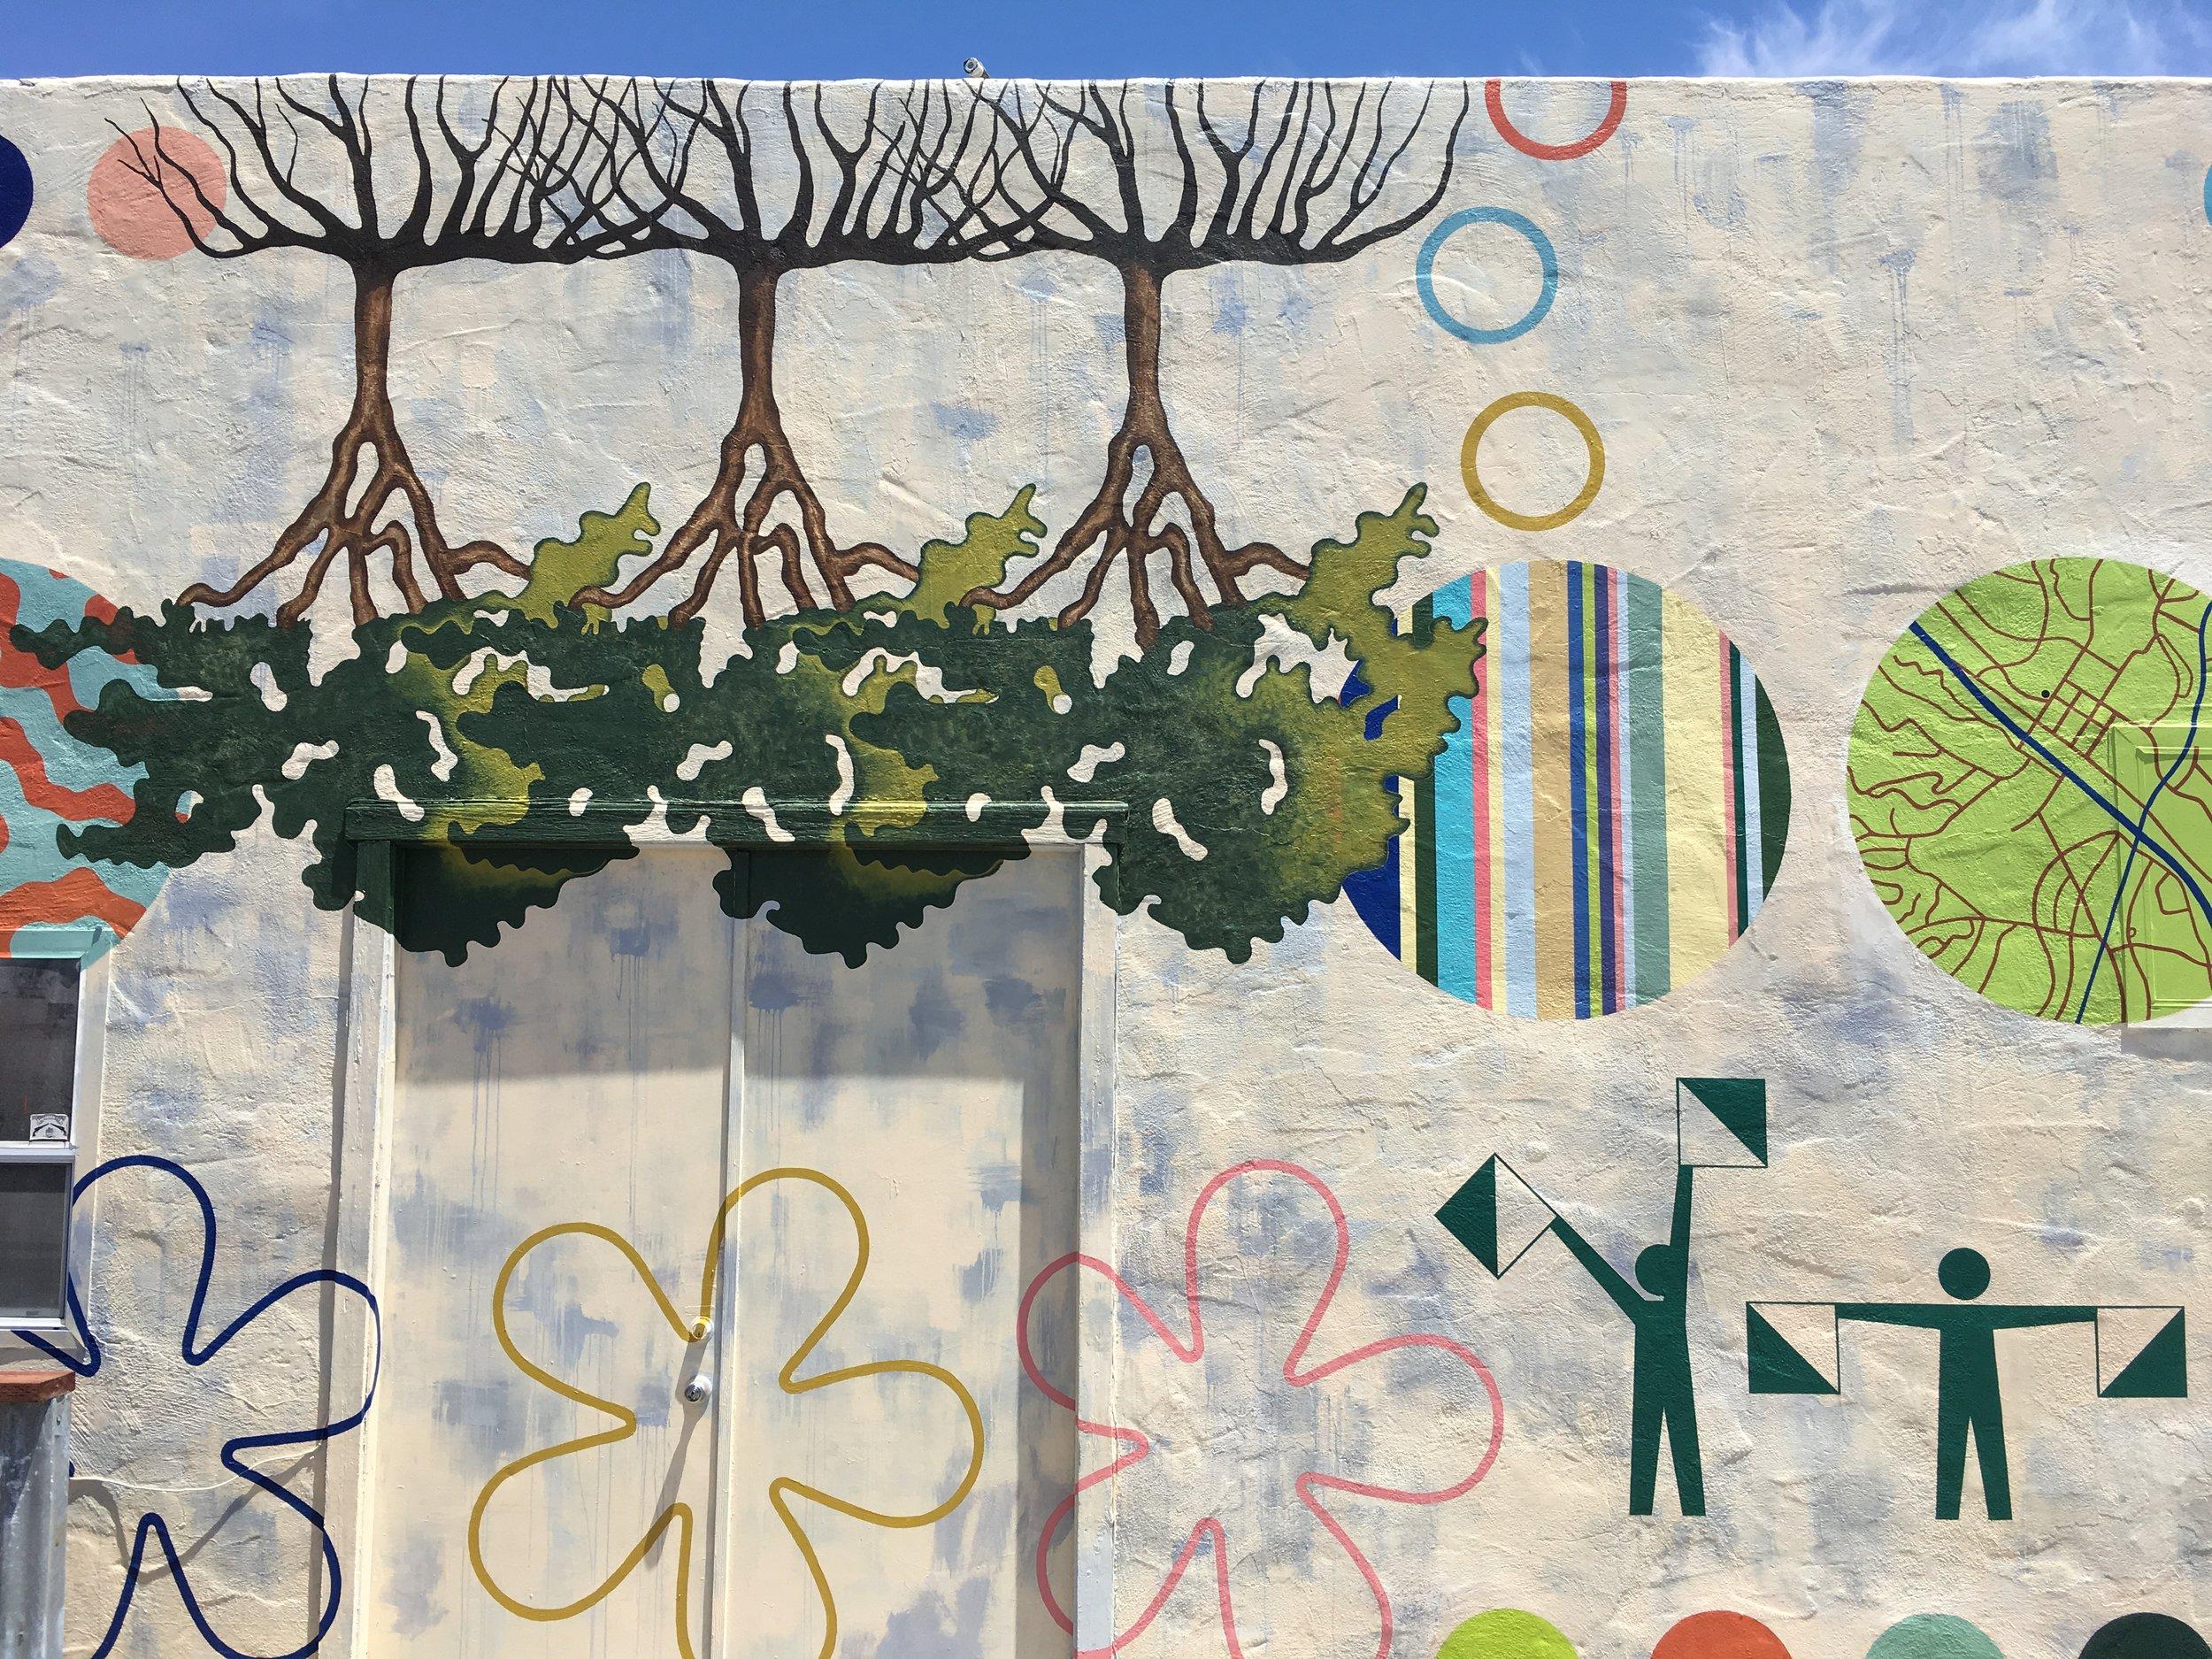 TREE CITY,   detail  Located on the ARTery Building  Atascadero, CA 15 feet x 50 feet 2018